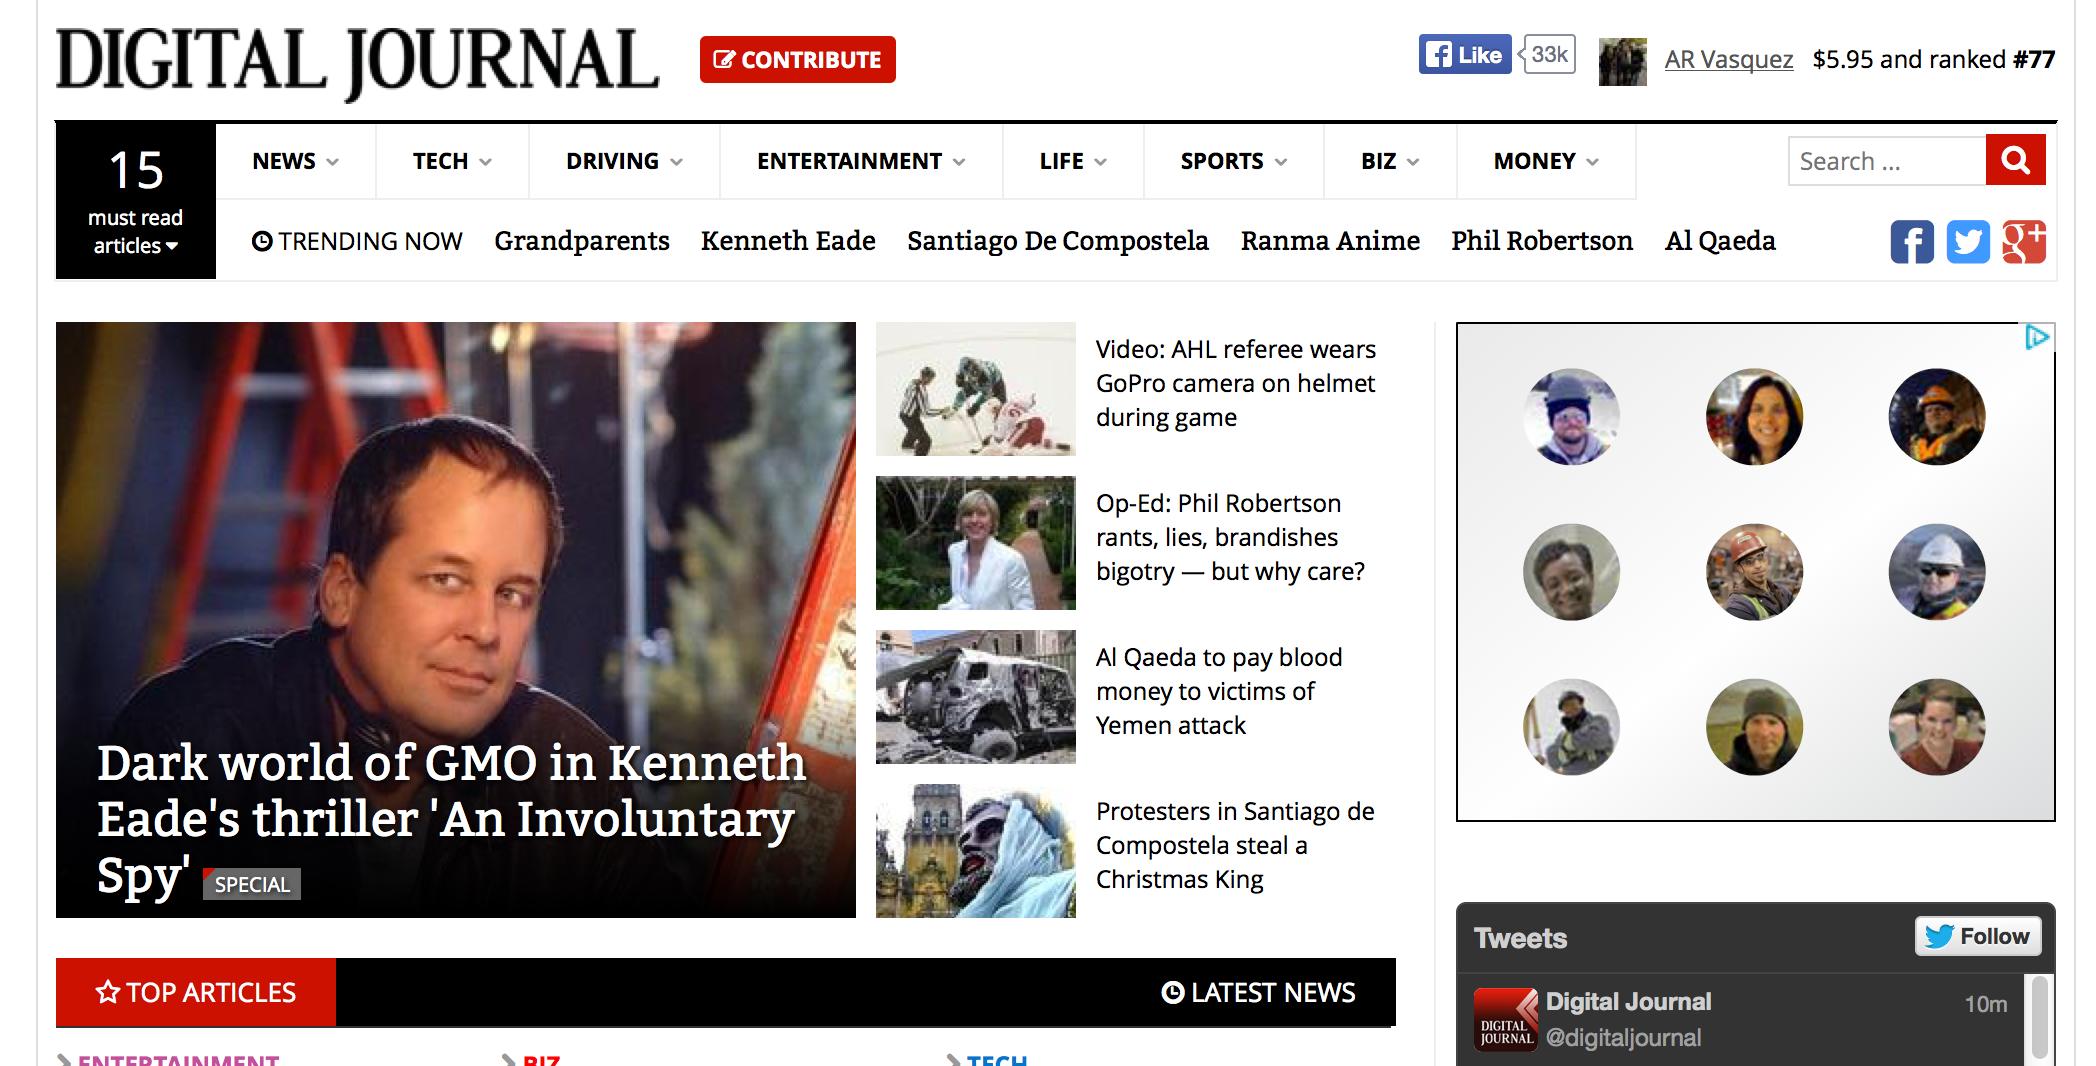 my interview with Kenneth Eade headlines Digital Journal site